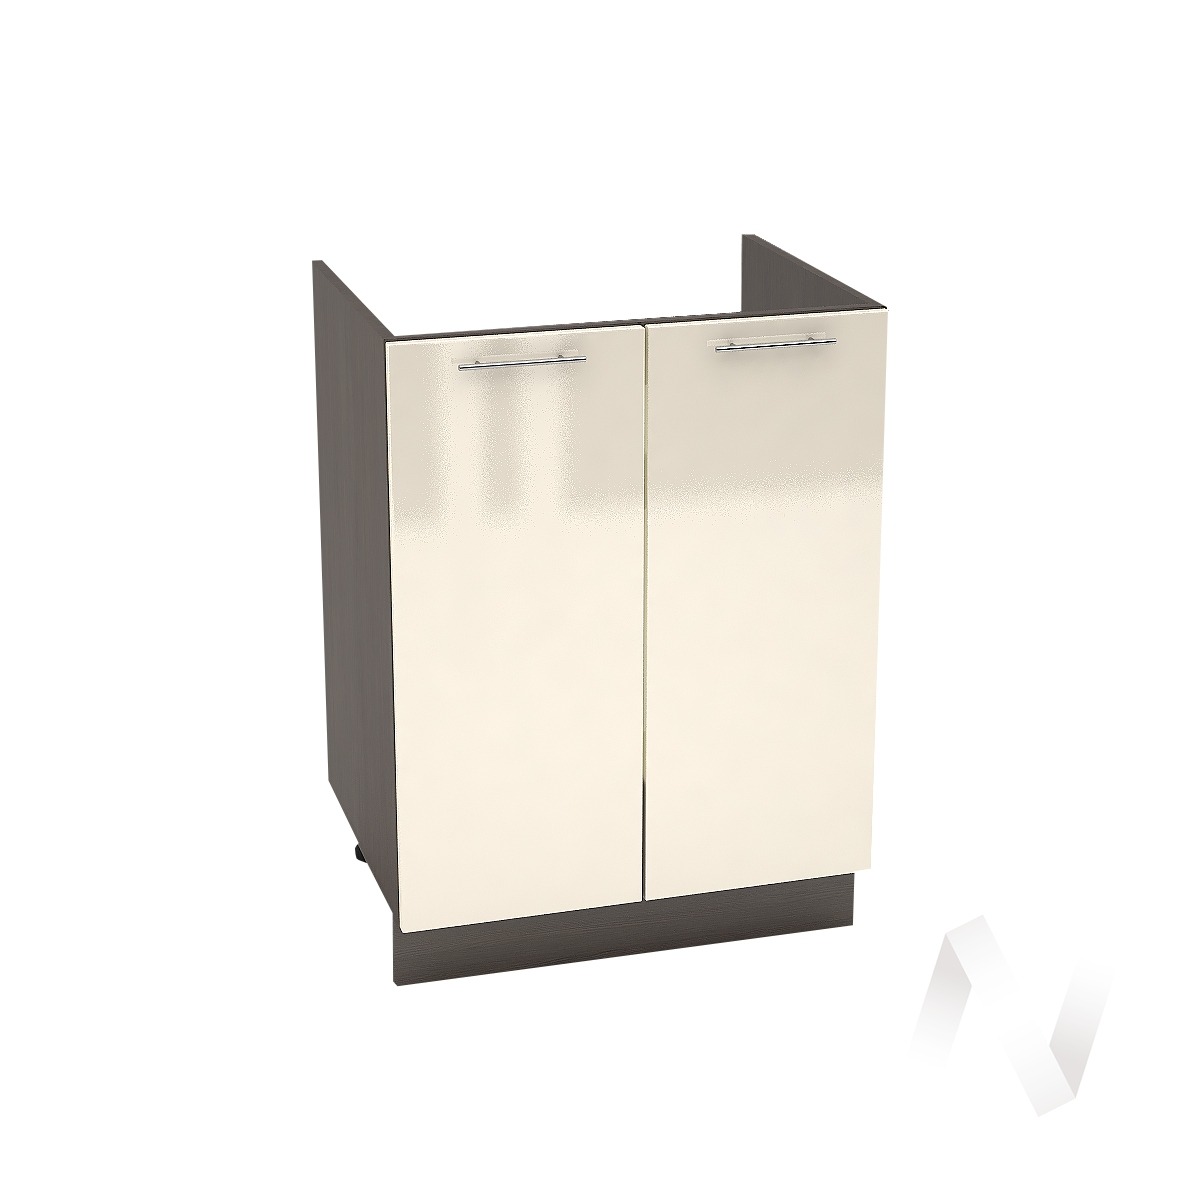 "Кухня ""Валерия-М"": Шкаф нижний под мойку 600, ШНМ 600 (Ваниль глянец/корпус венге)"